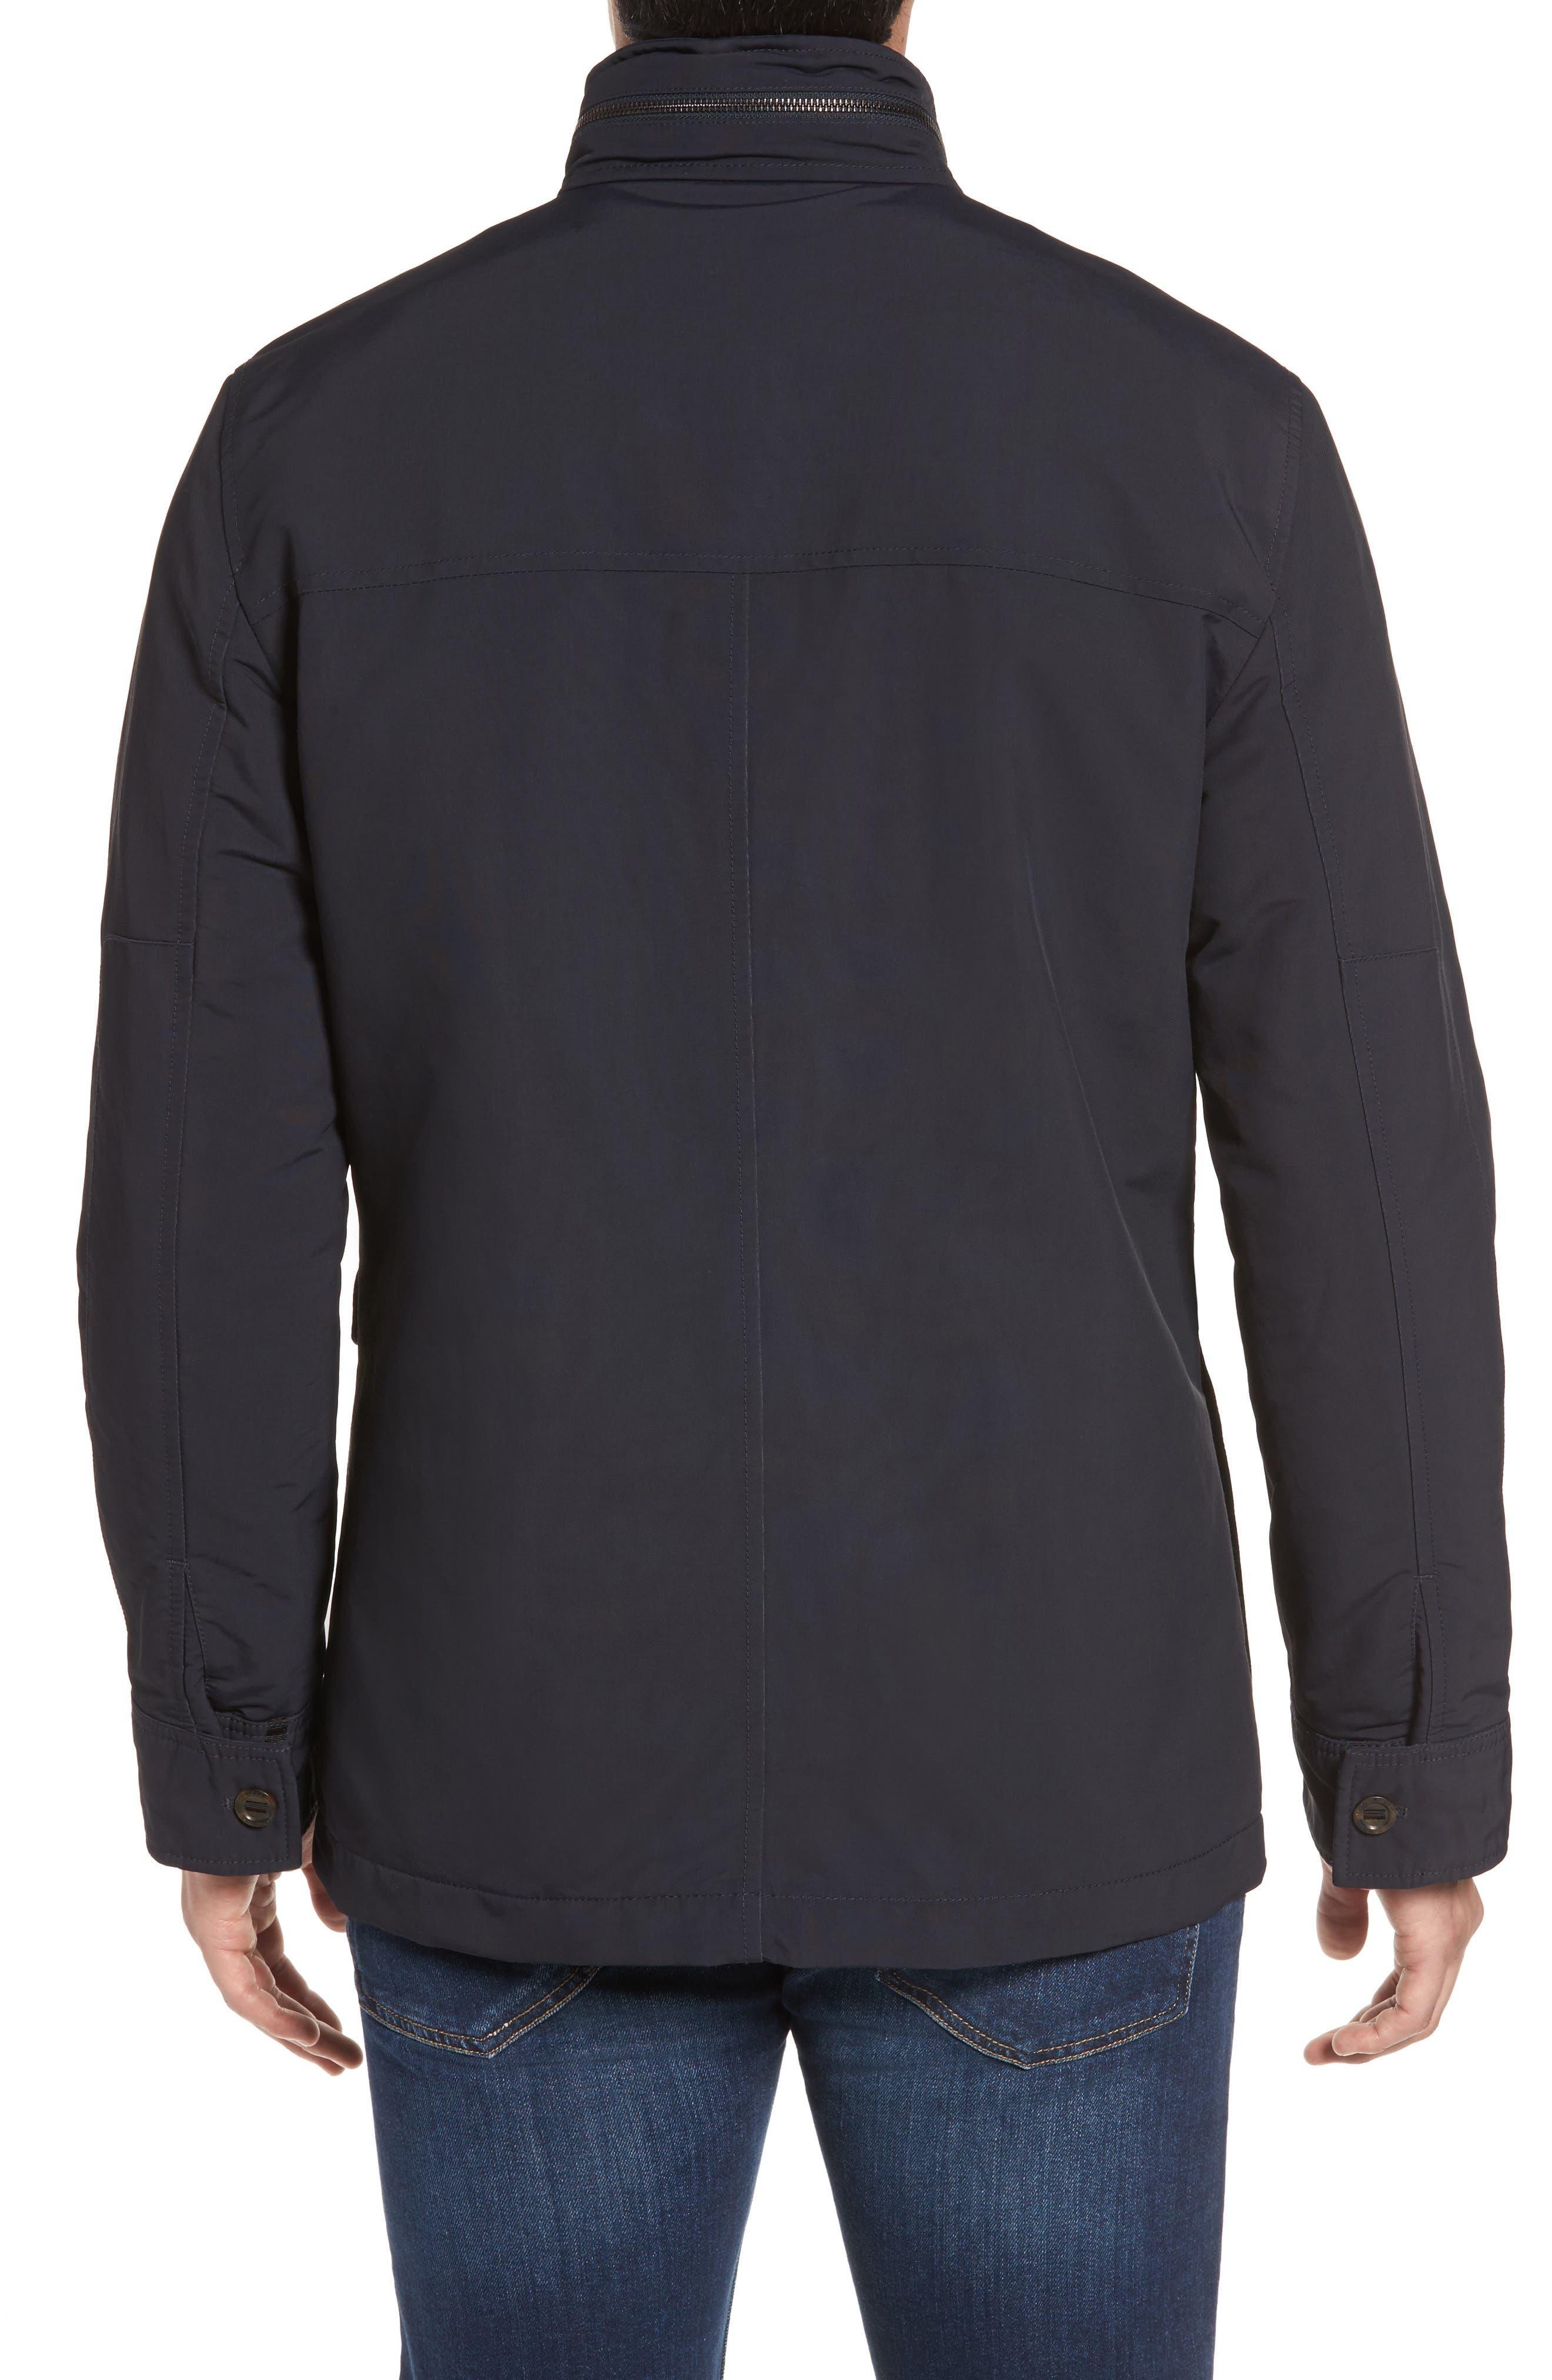 Bendigo Utility Jacket,                             Alternate thumbnail 2, color,                             ECLIPSE